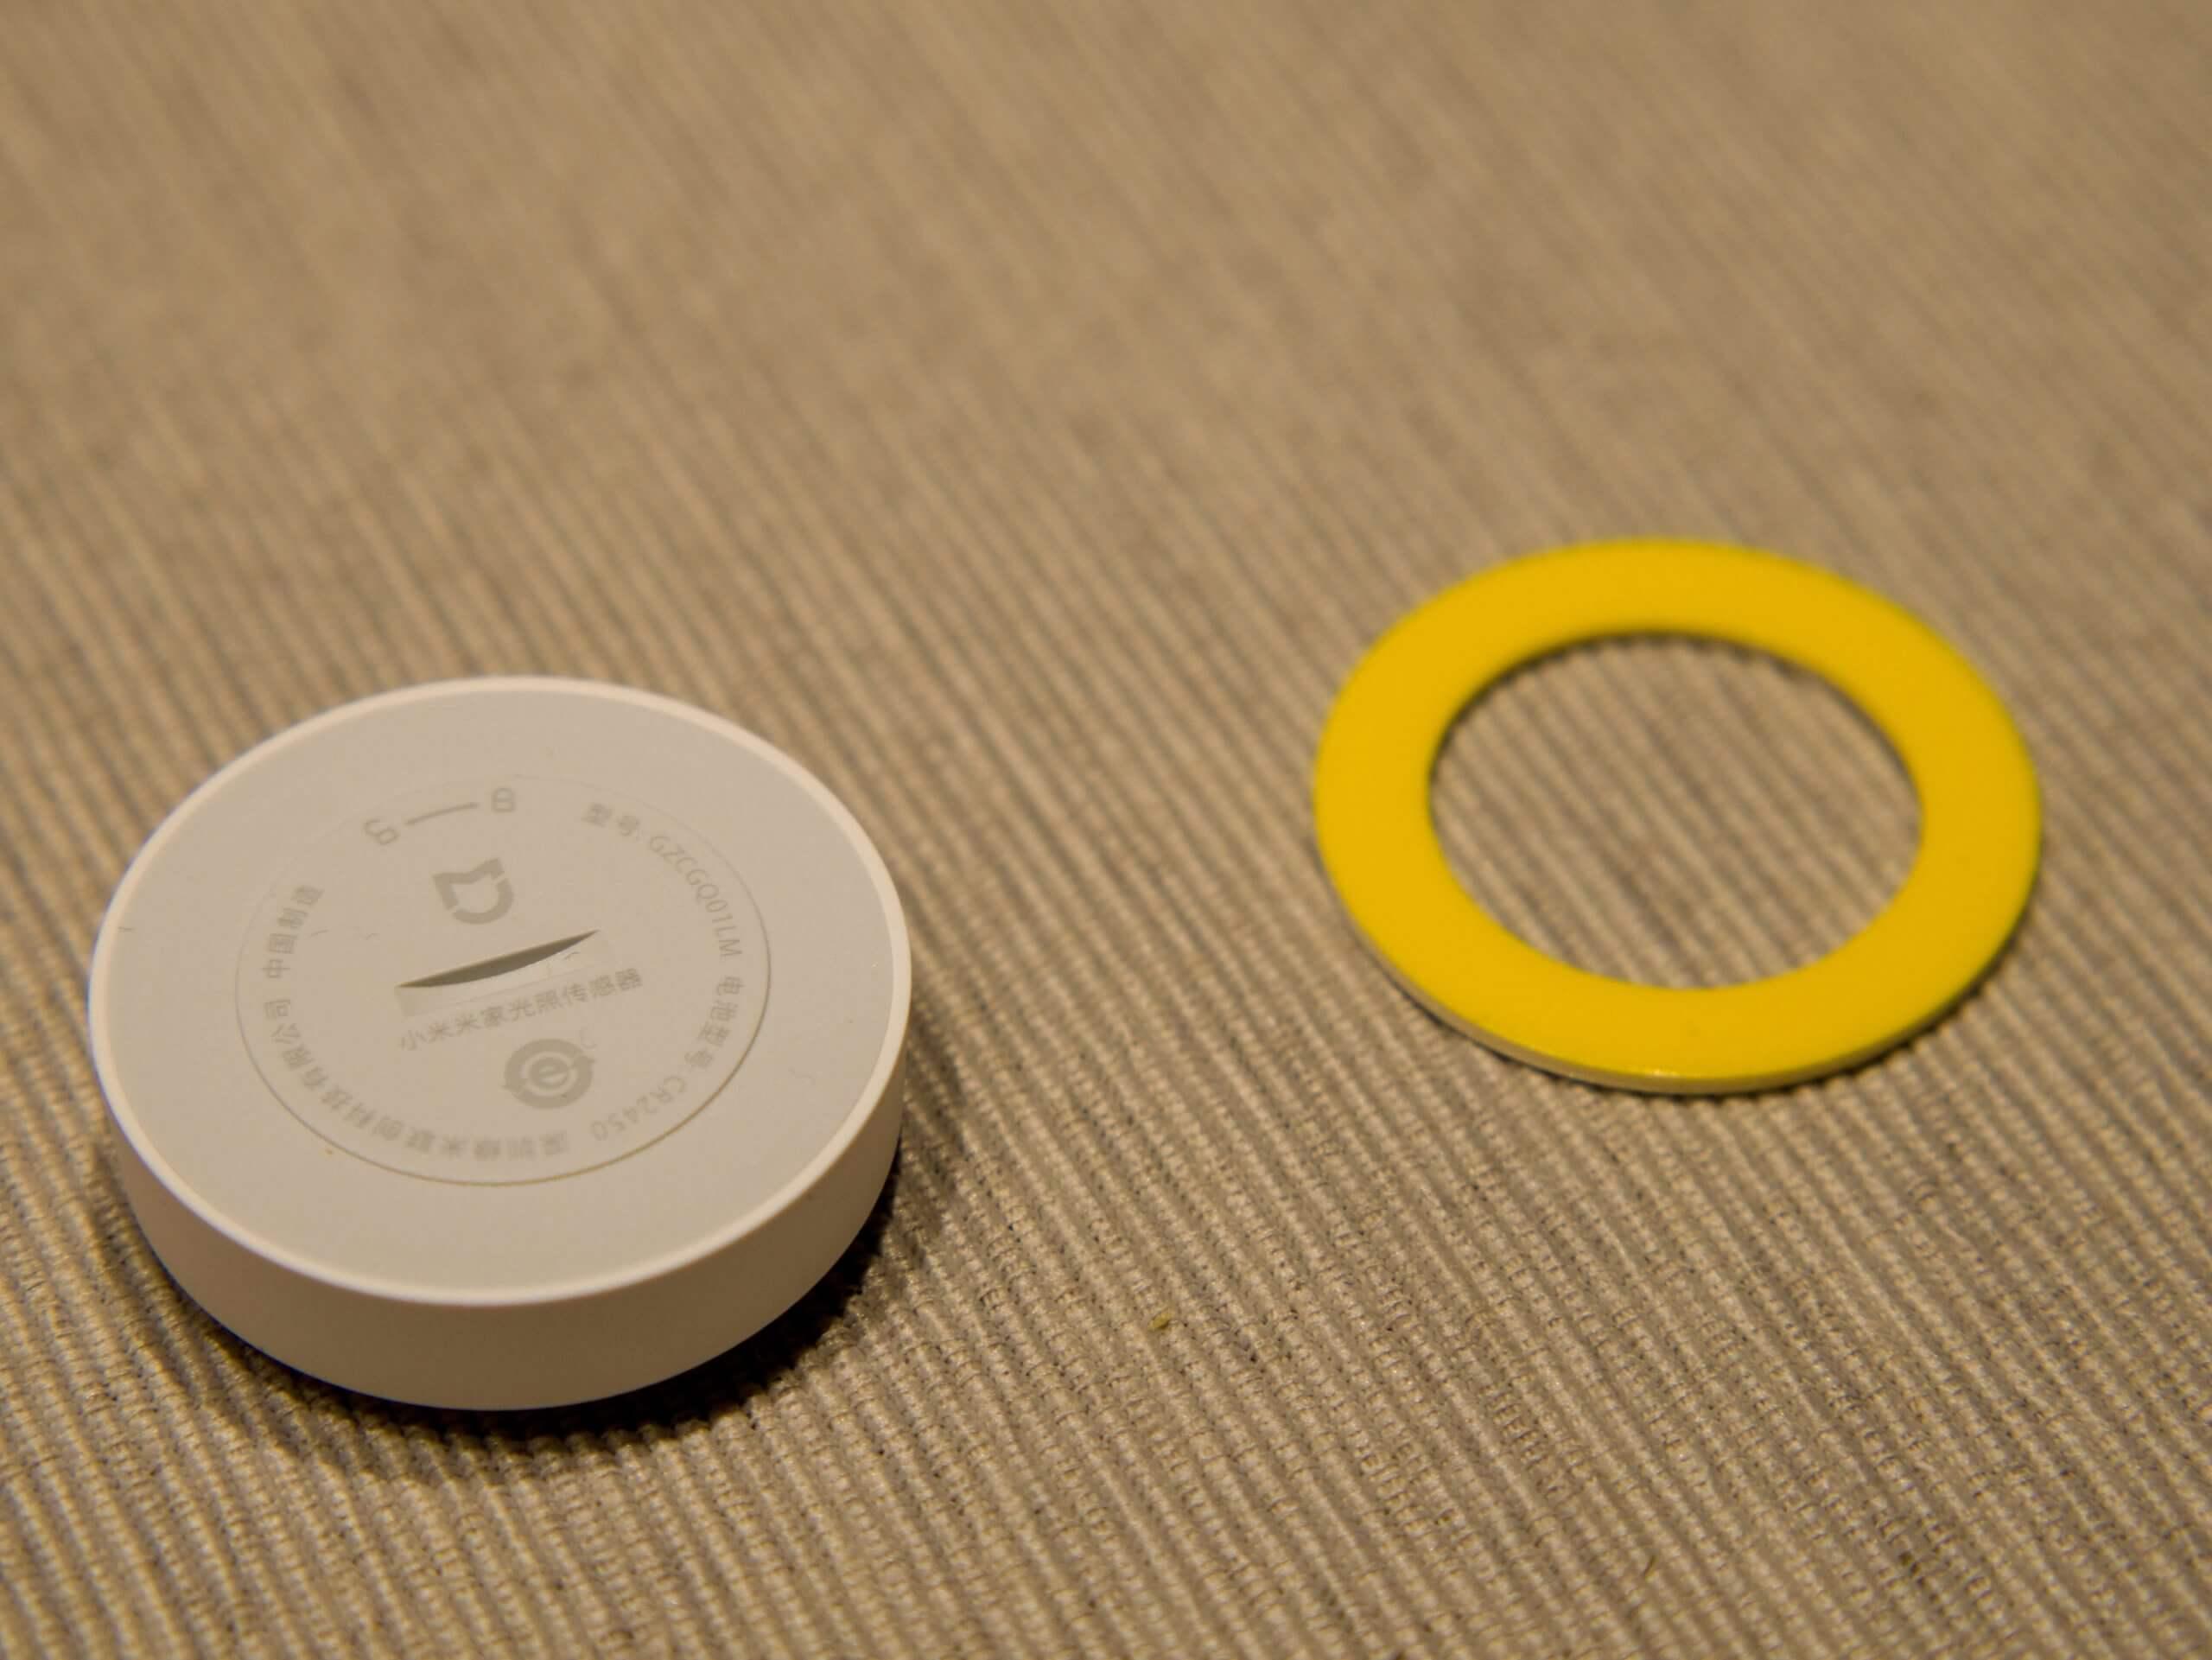 Xiaomi Mi Light Sensor